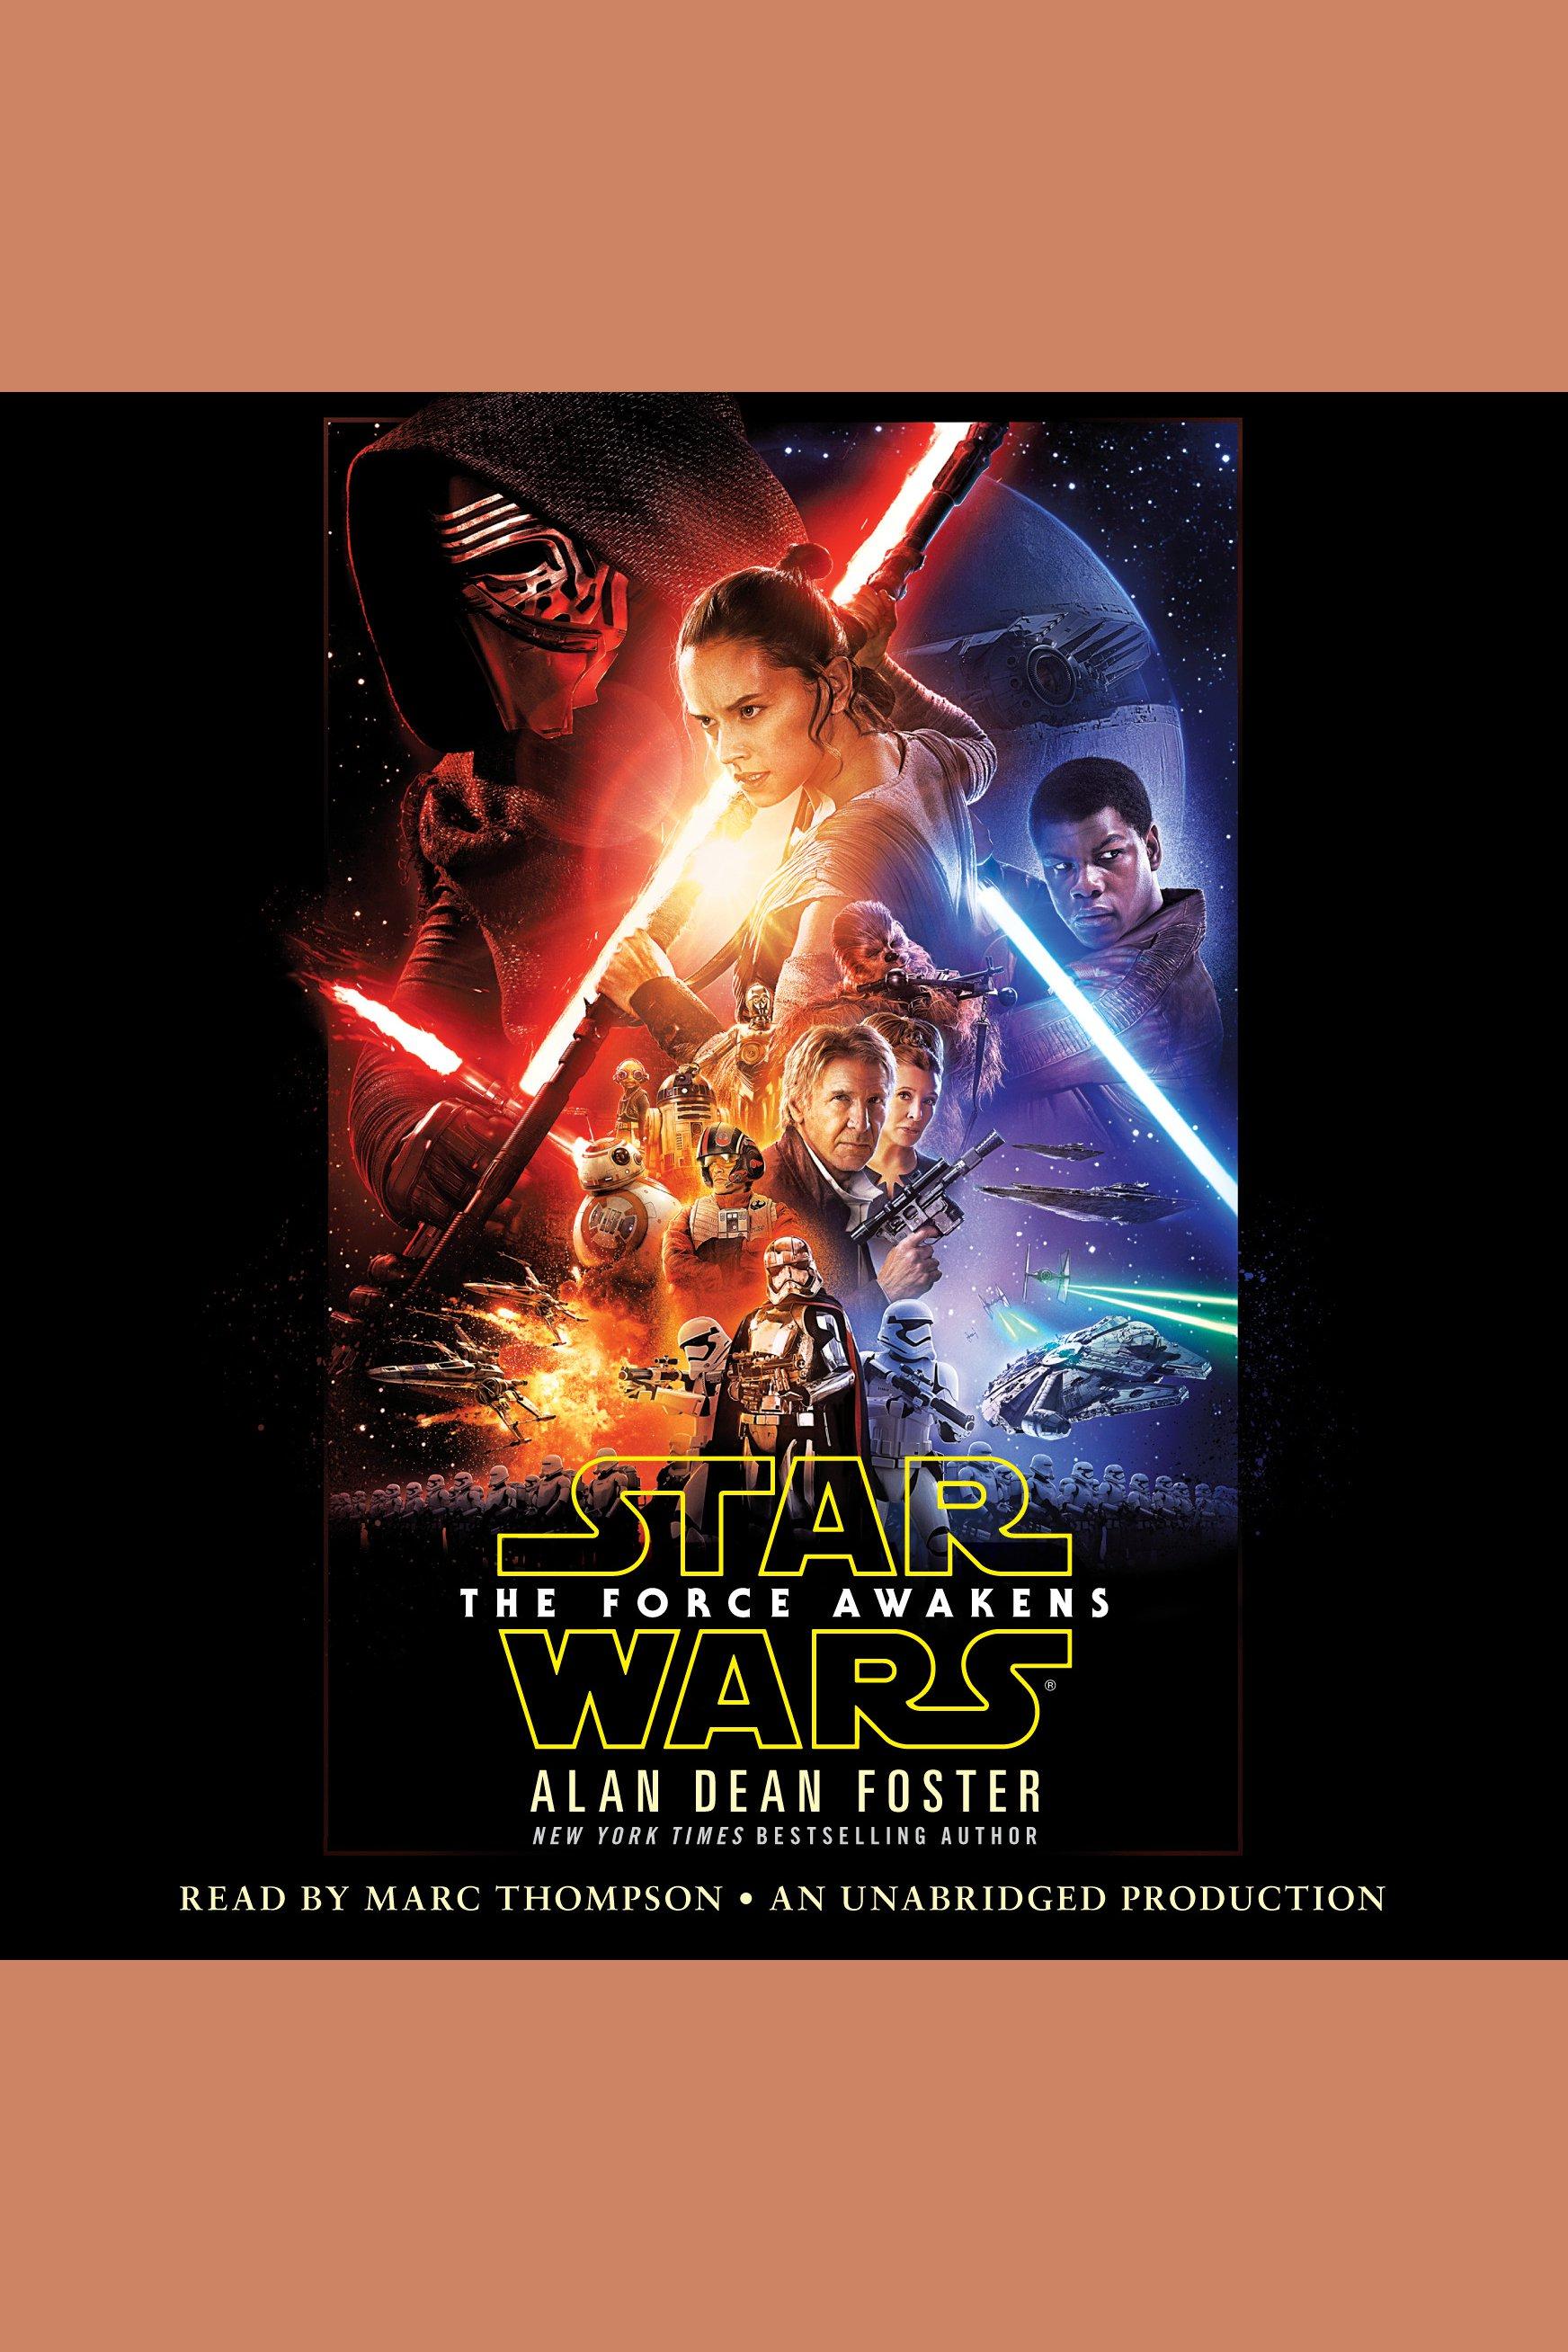 Force Awakens (Star Wars), The